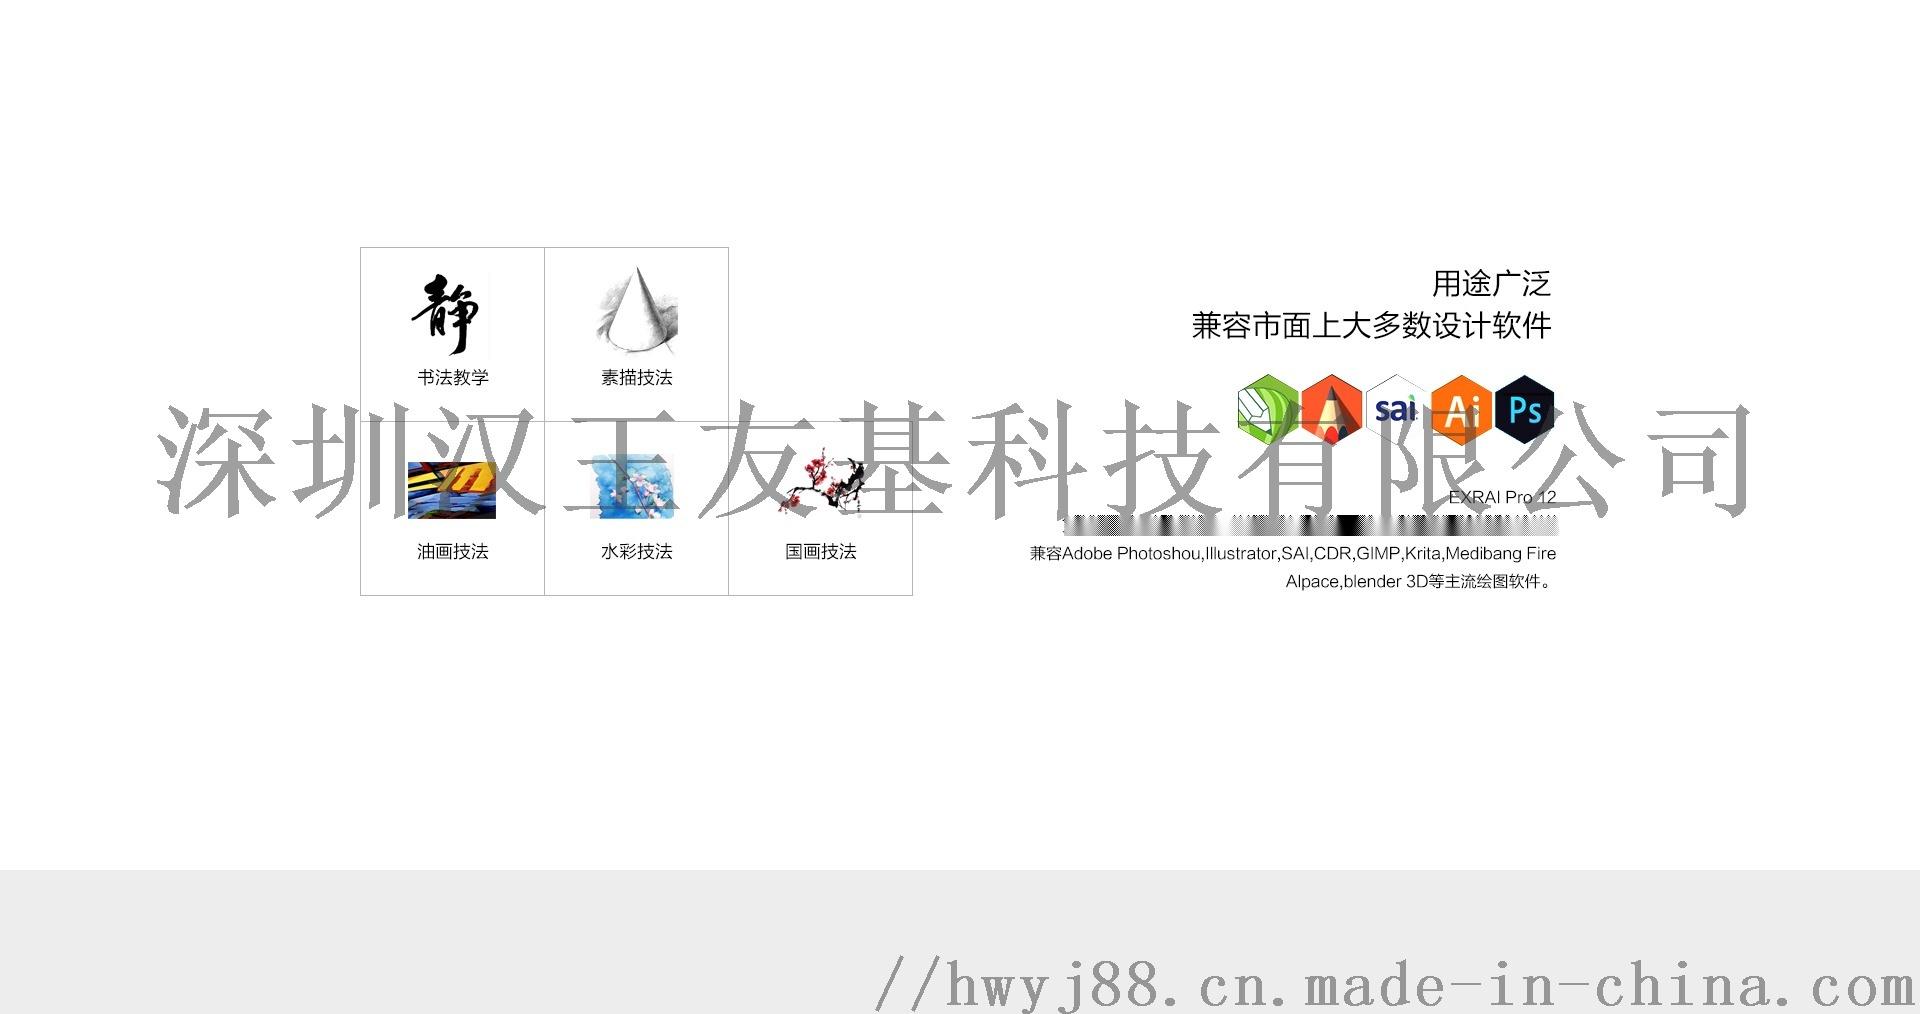 EXPRO12_04.jpg